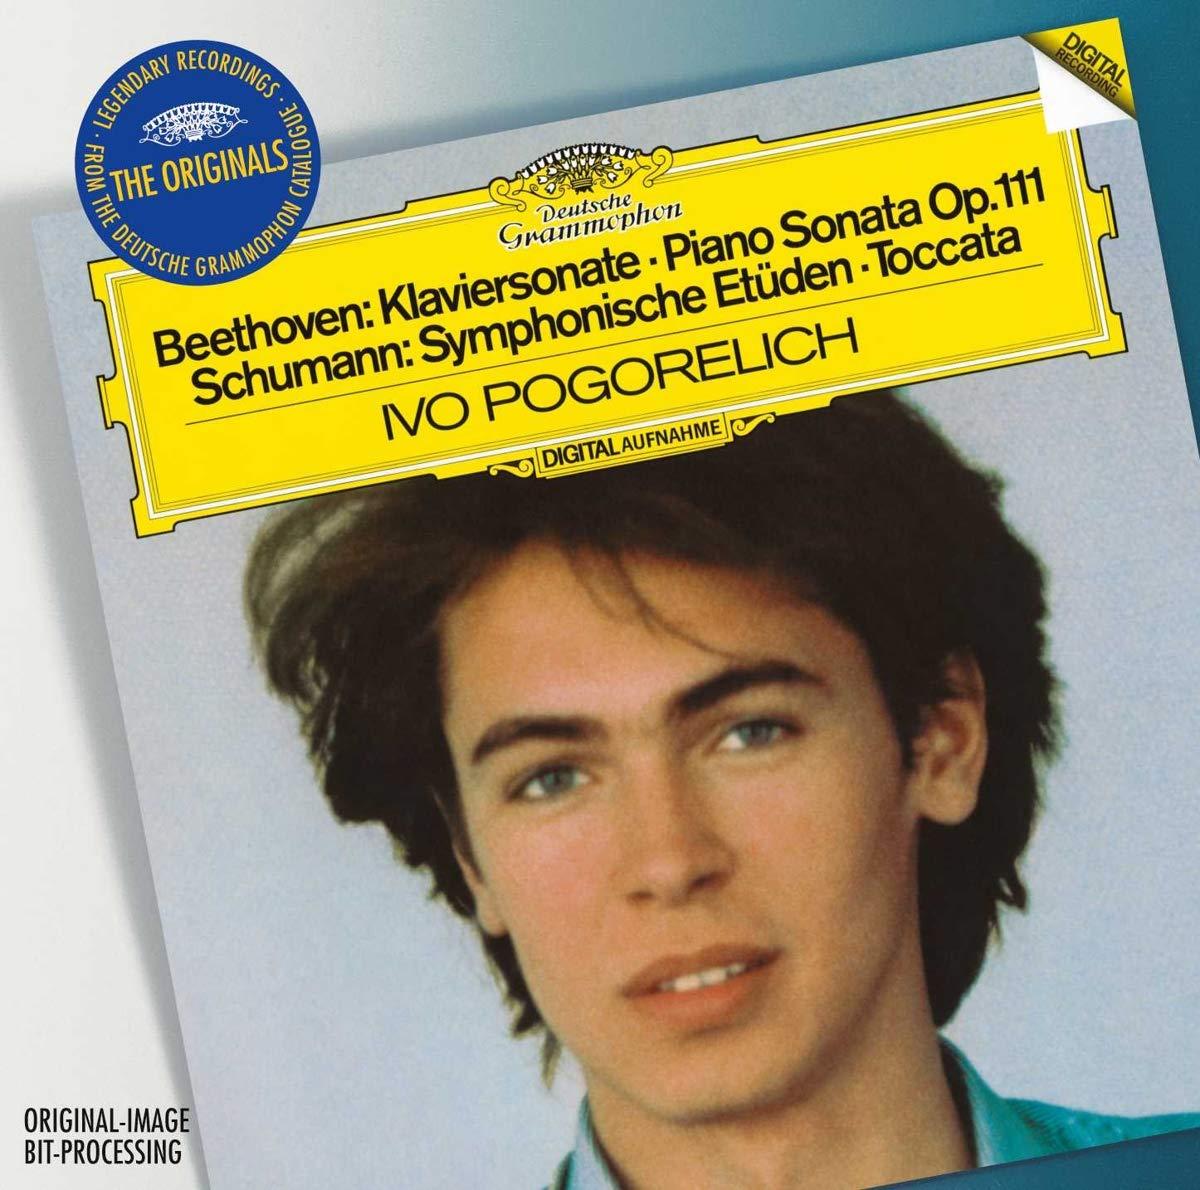 Beethoven: Cheap mail order sales 2021 Klaviersonate Piano Sonata Op.111 Schumann: Symphoni